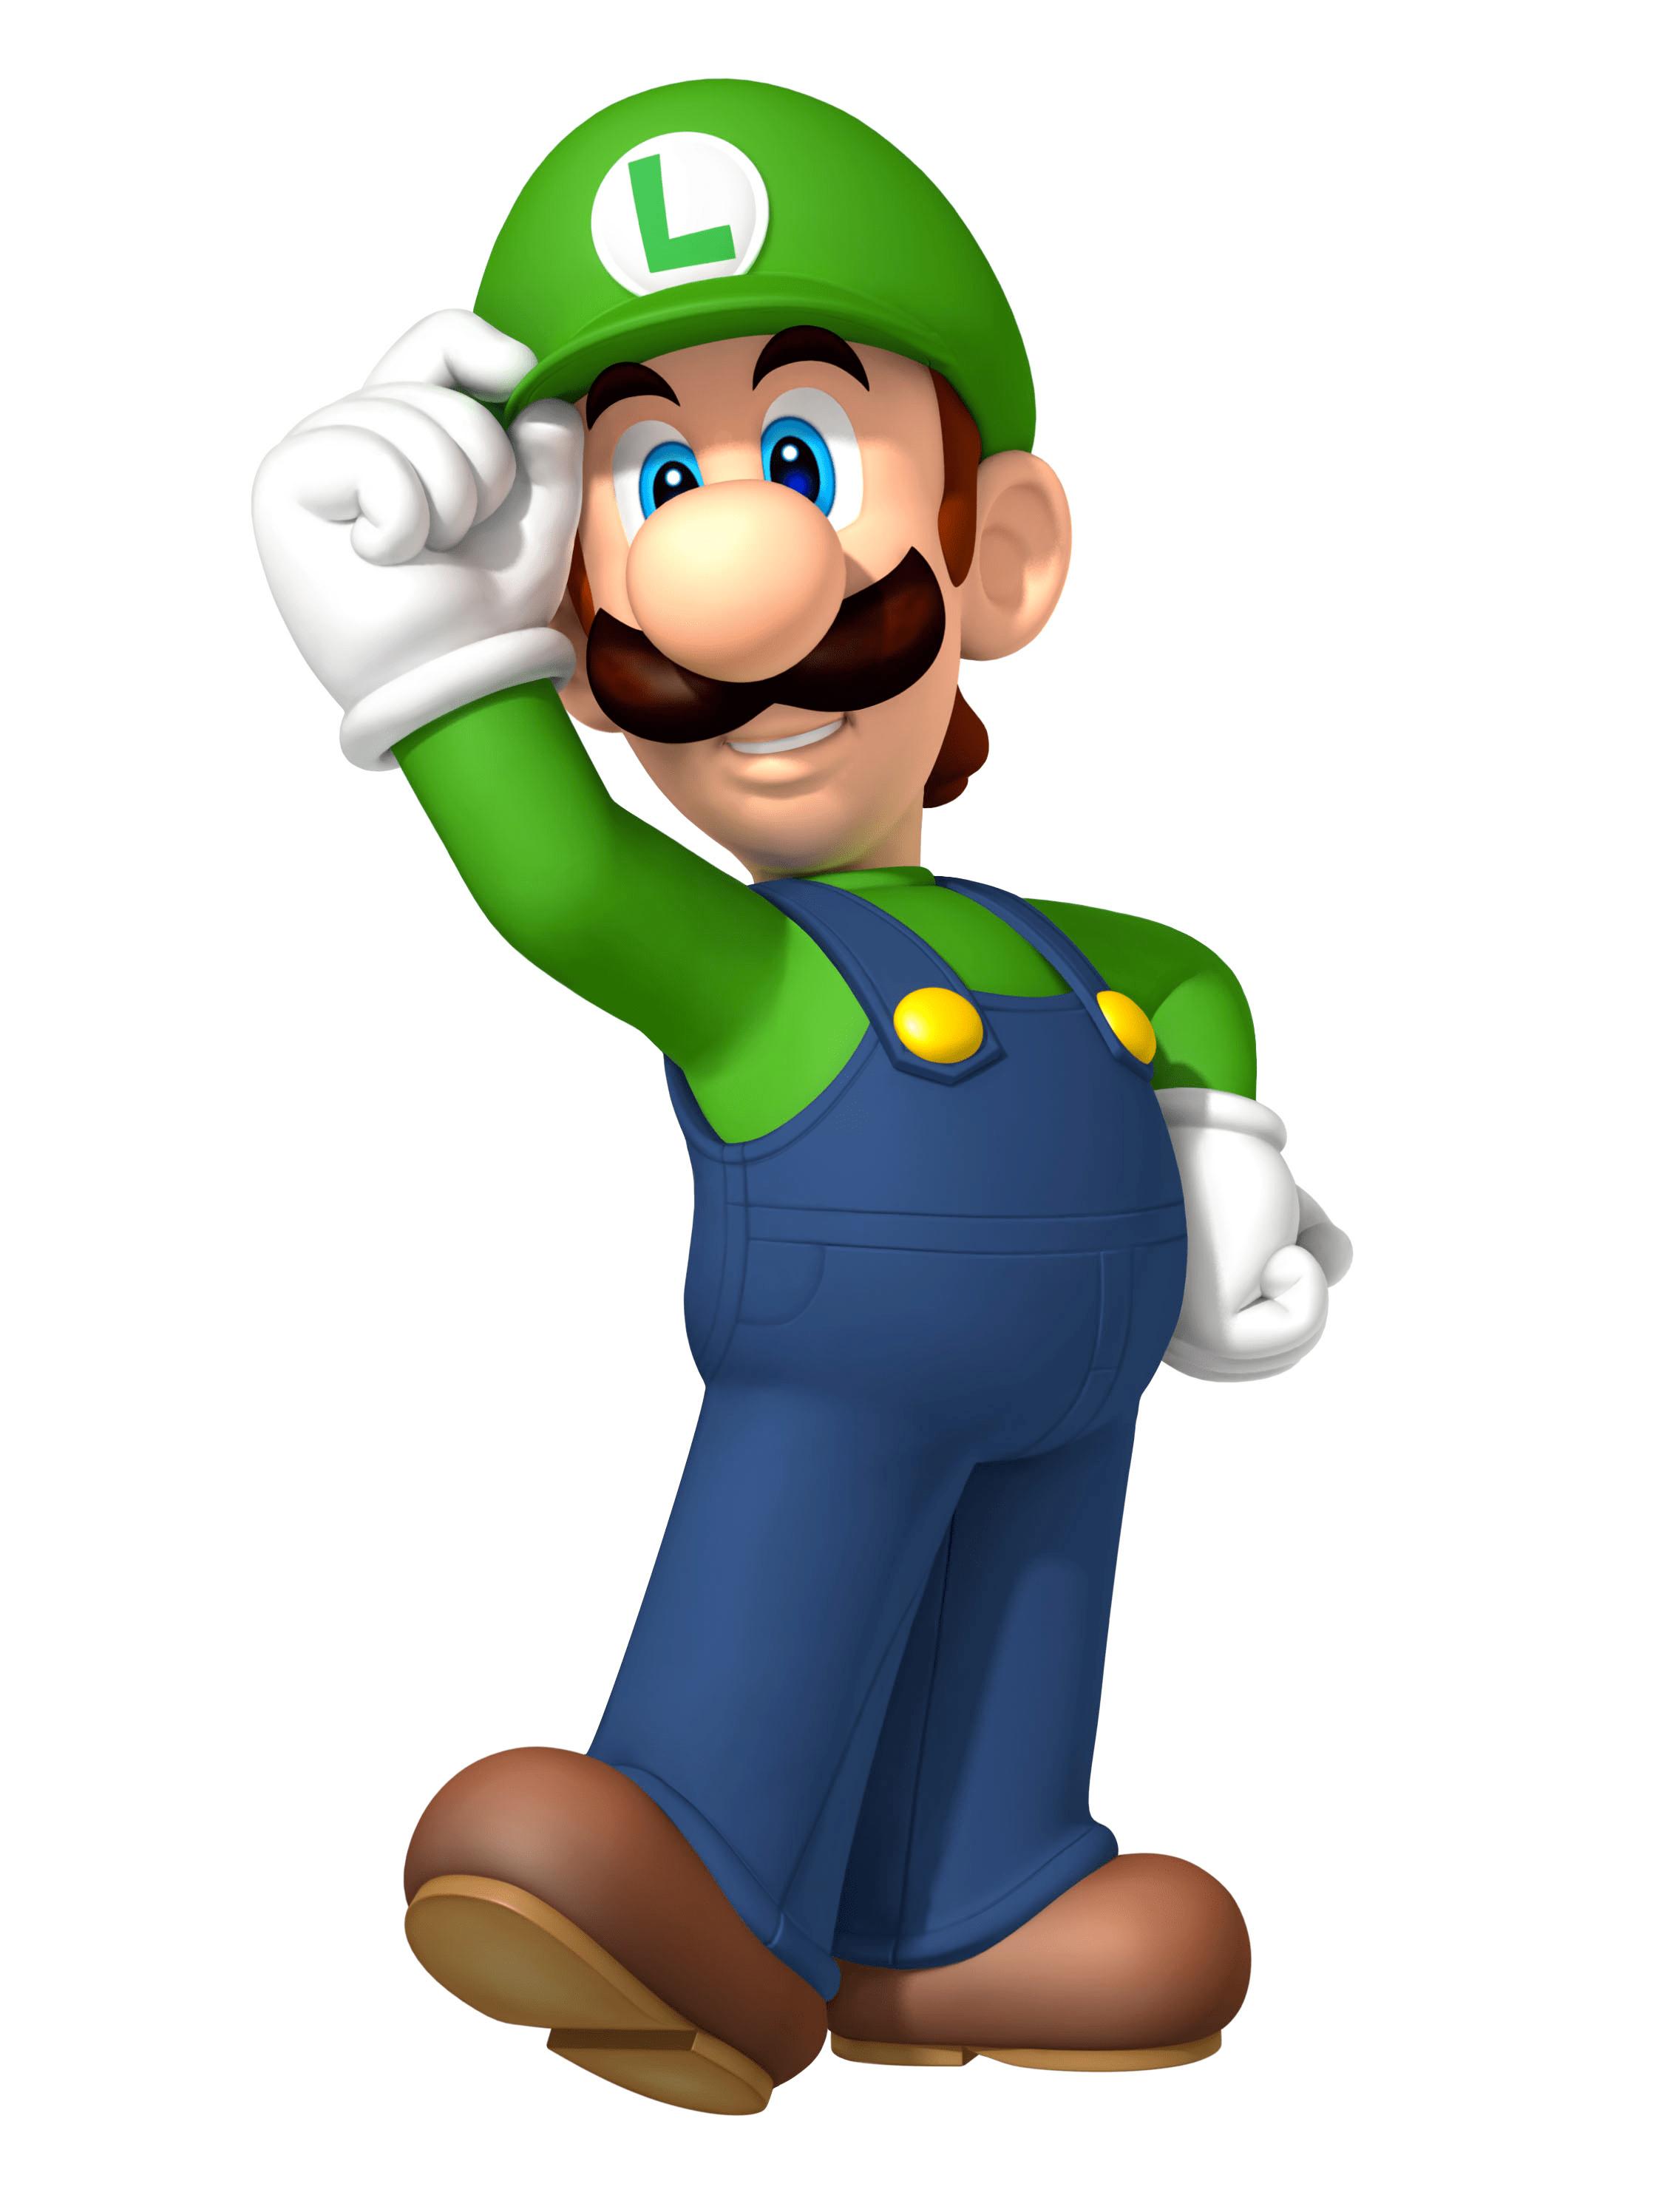 Mario party 9 gamescity - Luigi mario party ...